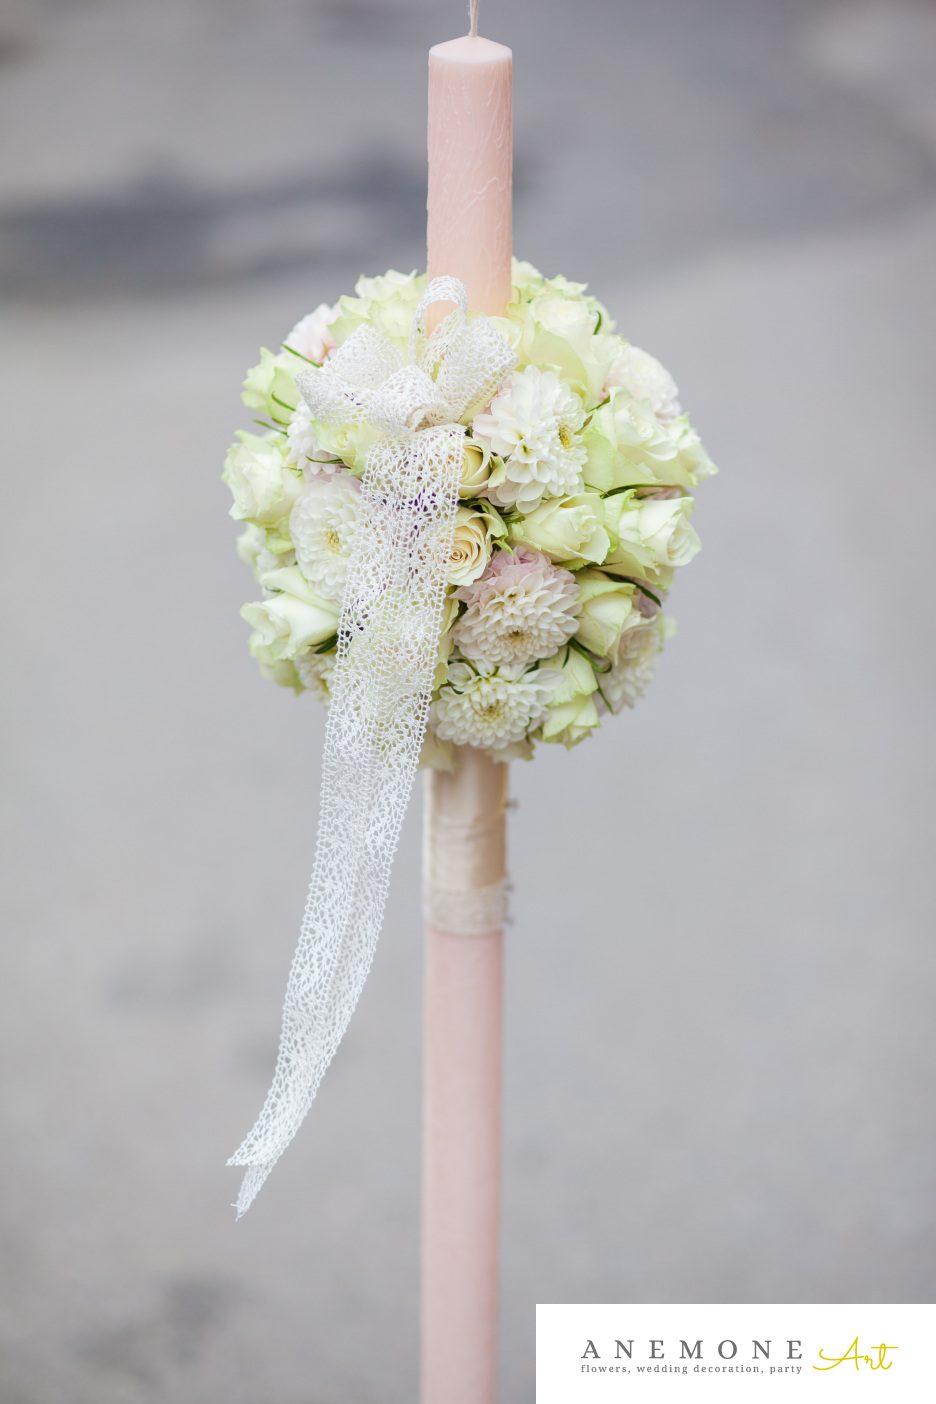 Poza, foto cu Flori de nunta alb, crem, glob, lumanare cununie, trandafiri in Arad, Timisoara, Oradea (wedding flowers, bouquets) nunta Arad, Timisoara, Oradea